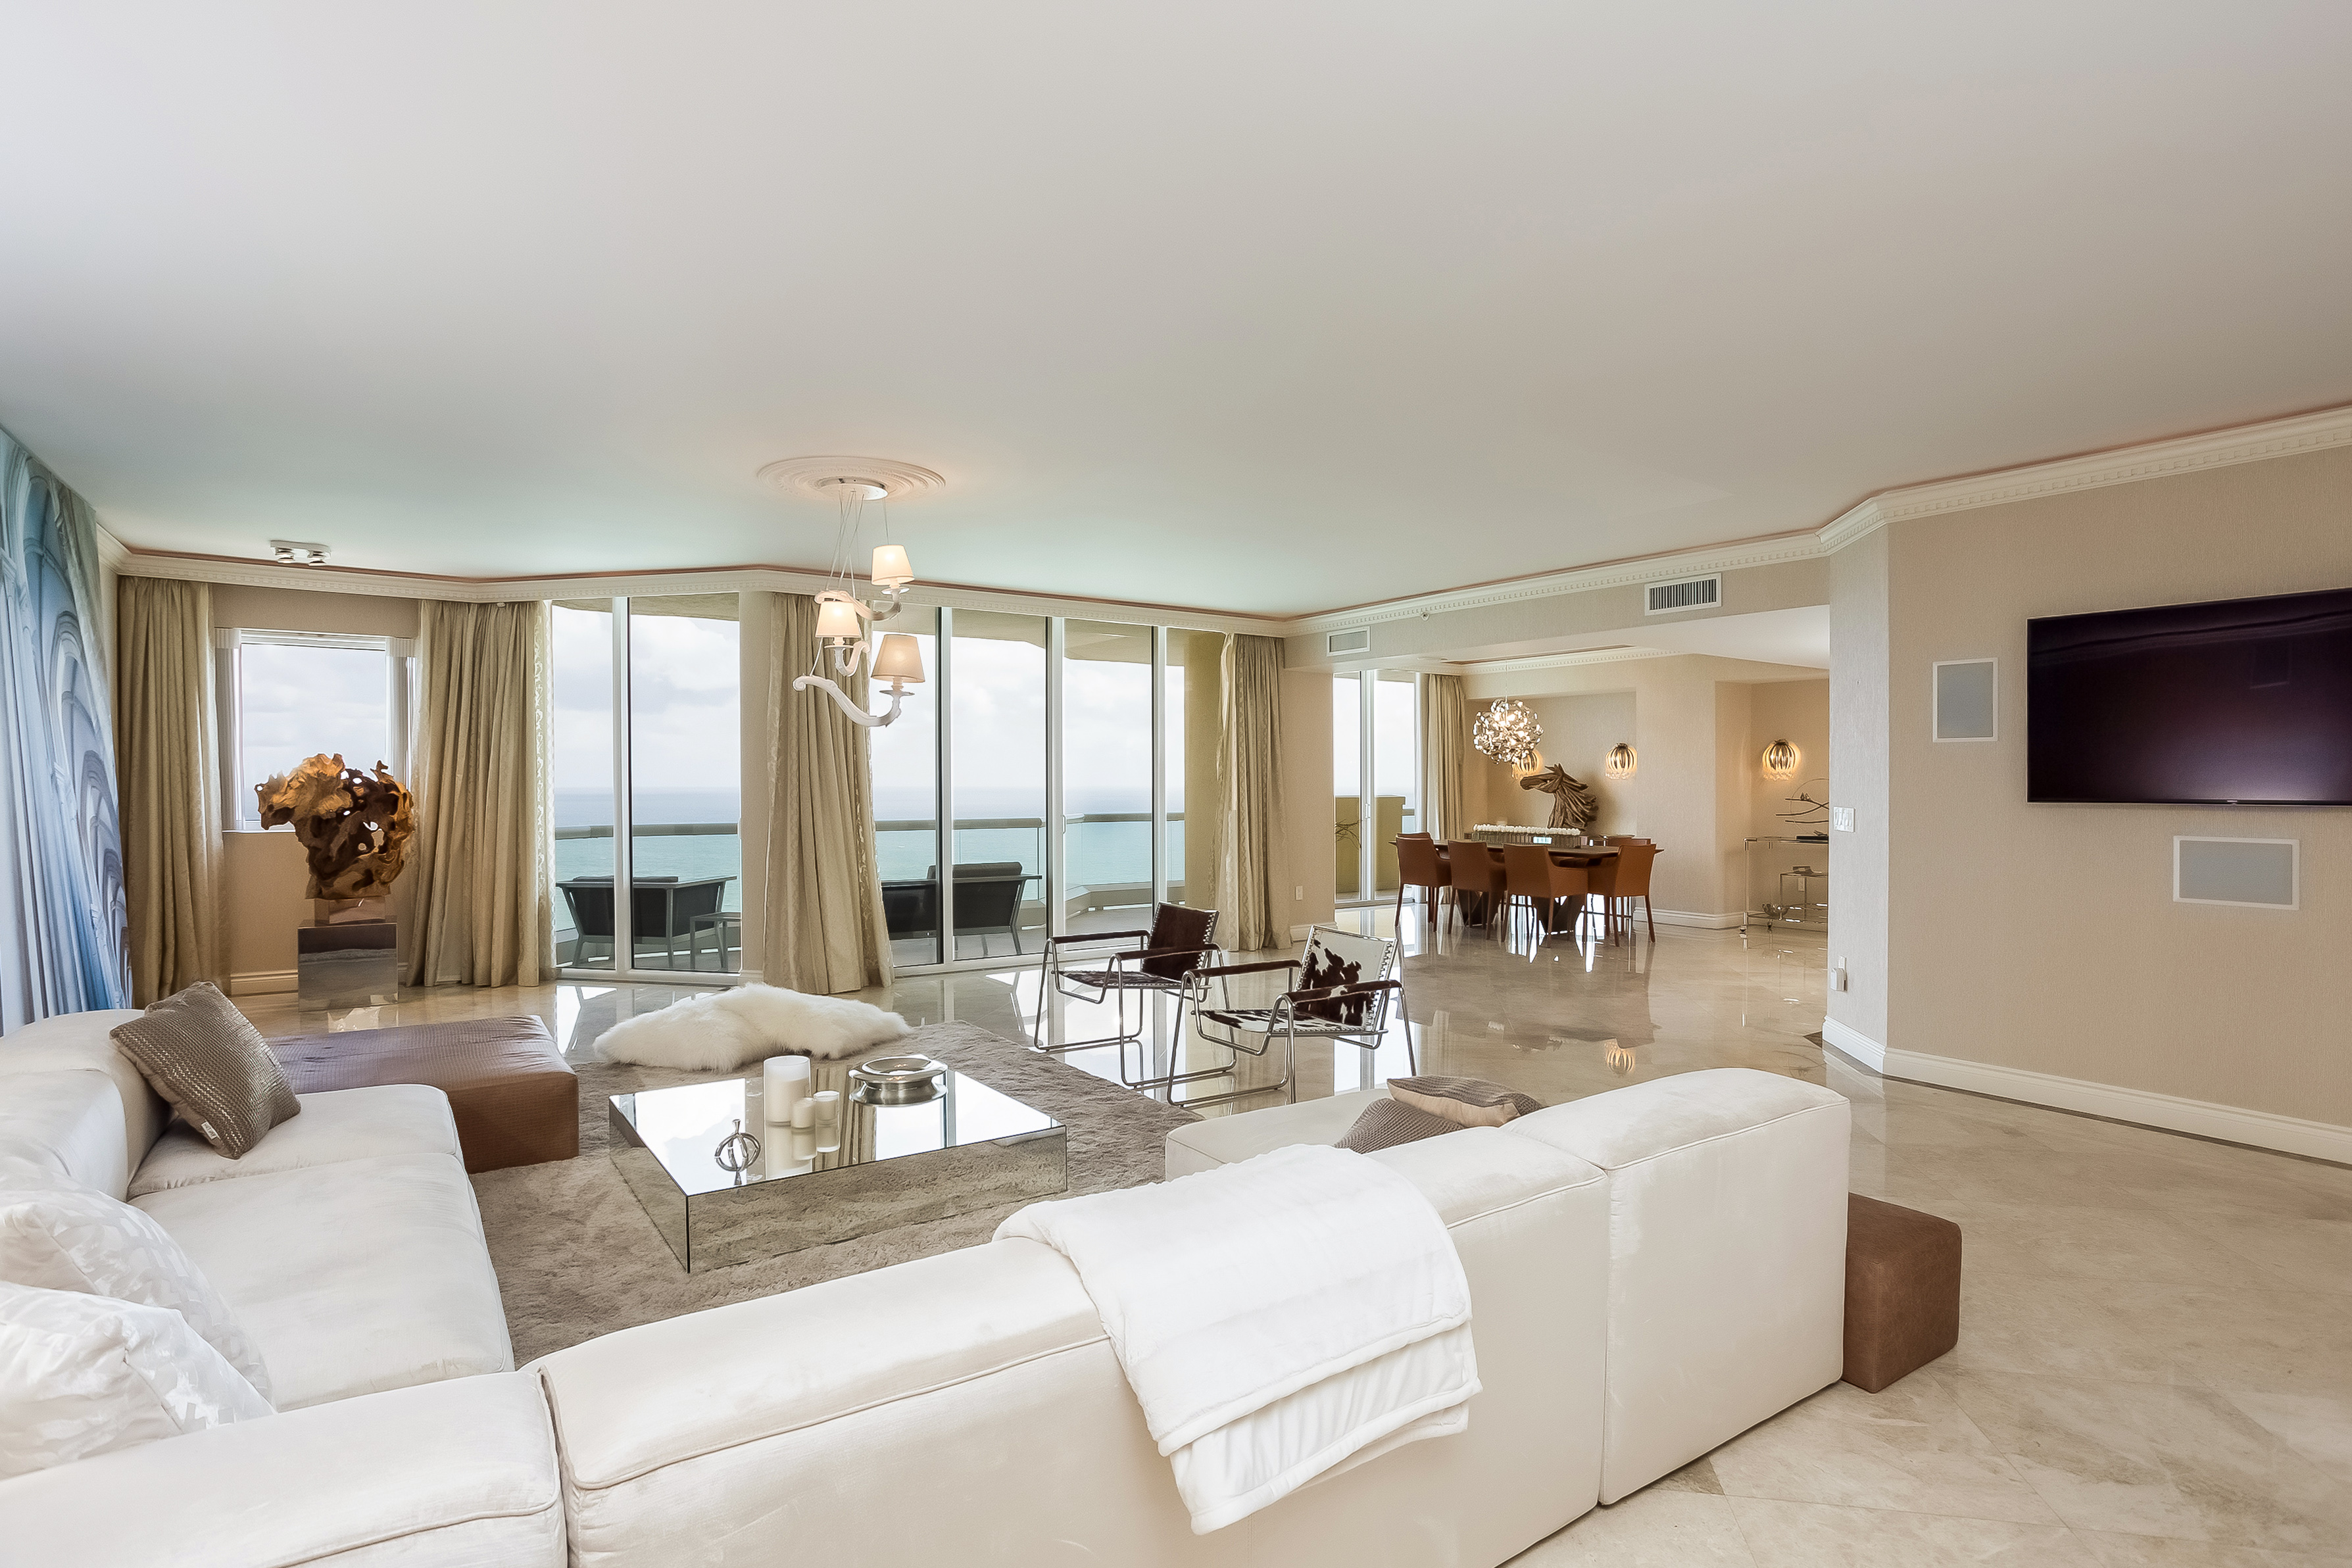 Condominium for Sale at 17875 Collins Av #3703 17875 Collins Av 3703 Sunny Isles Beach, Florida, 33160 United States